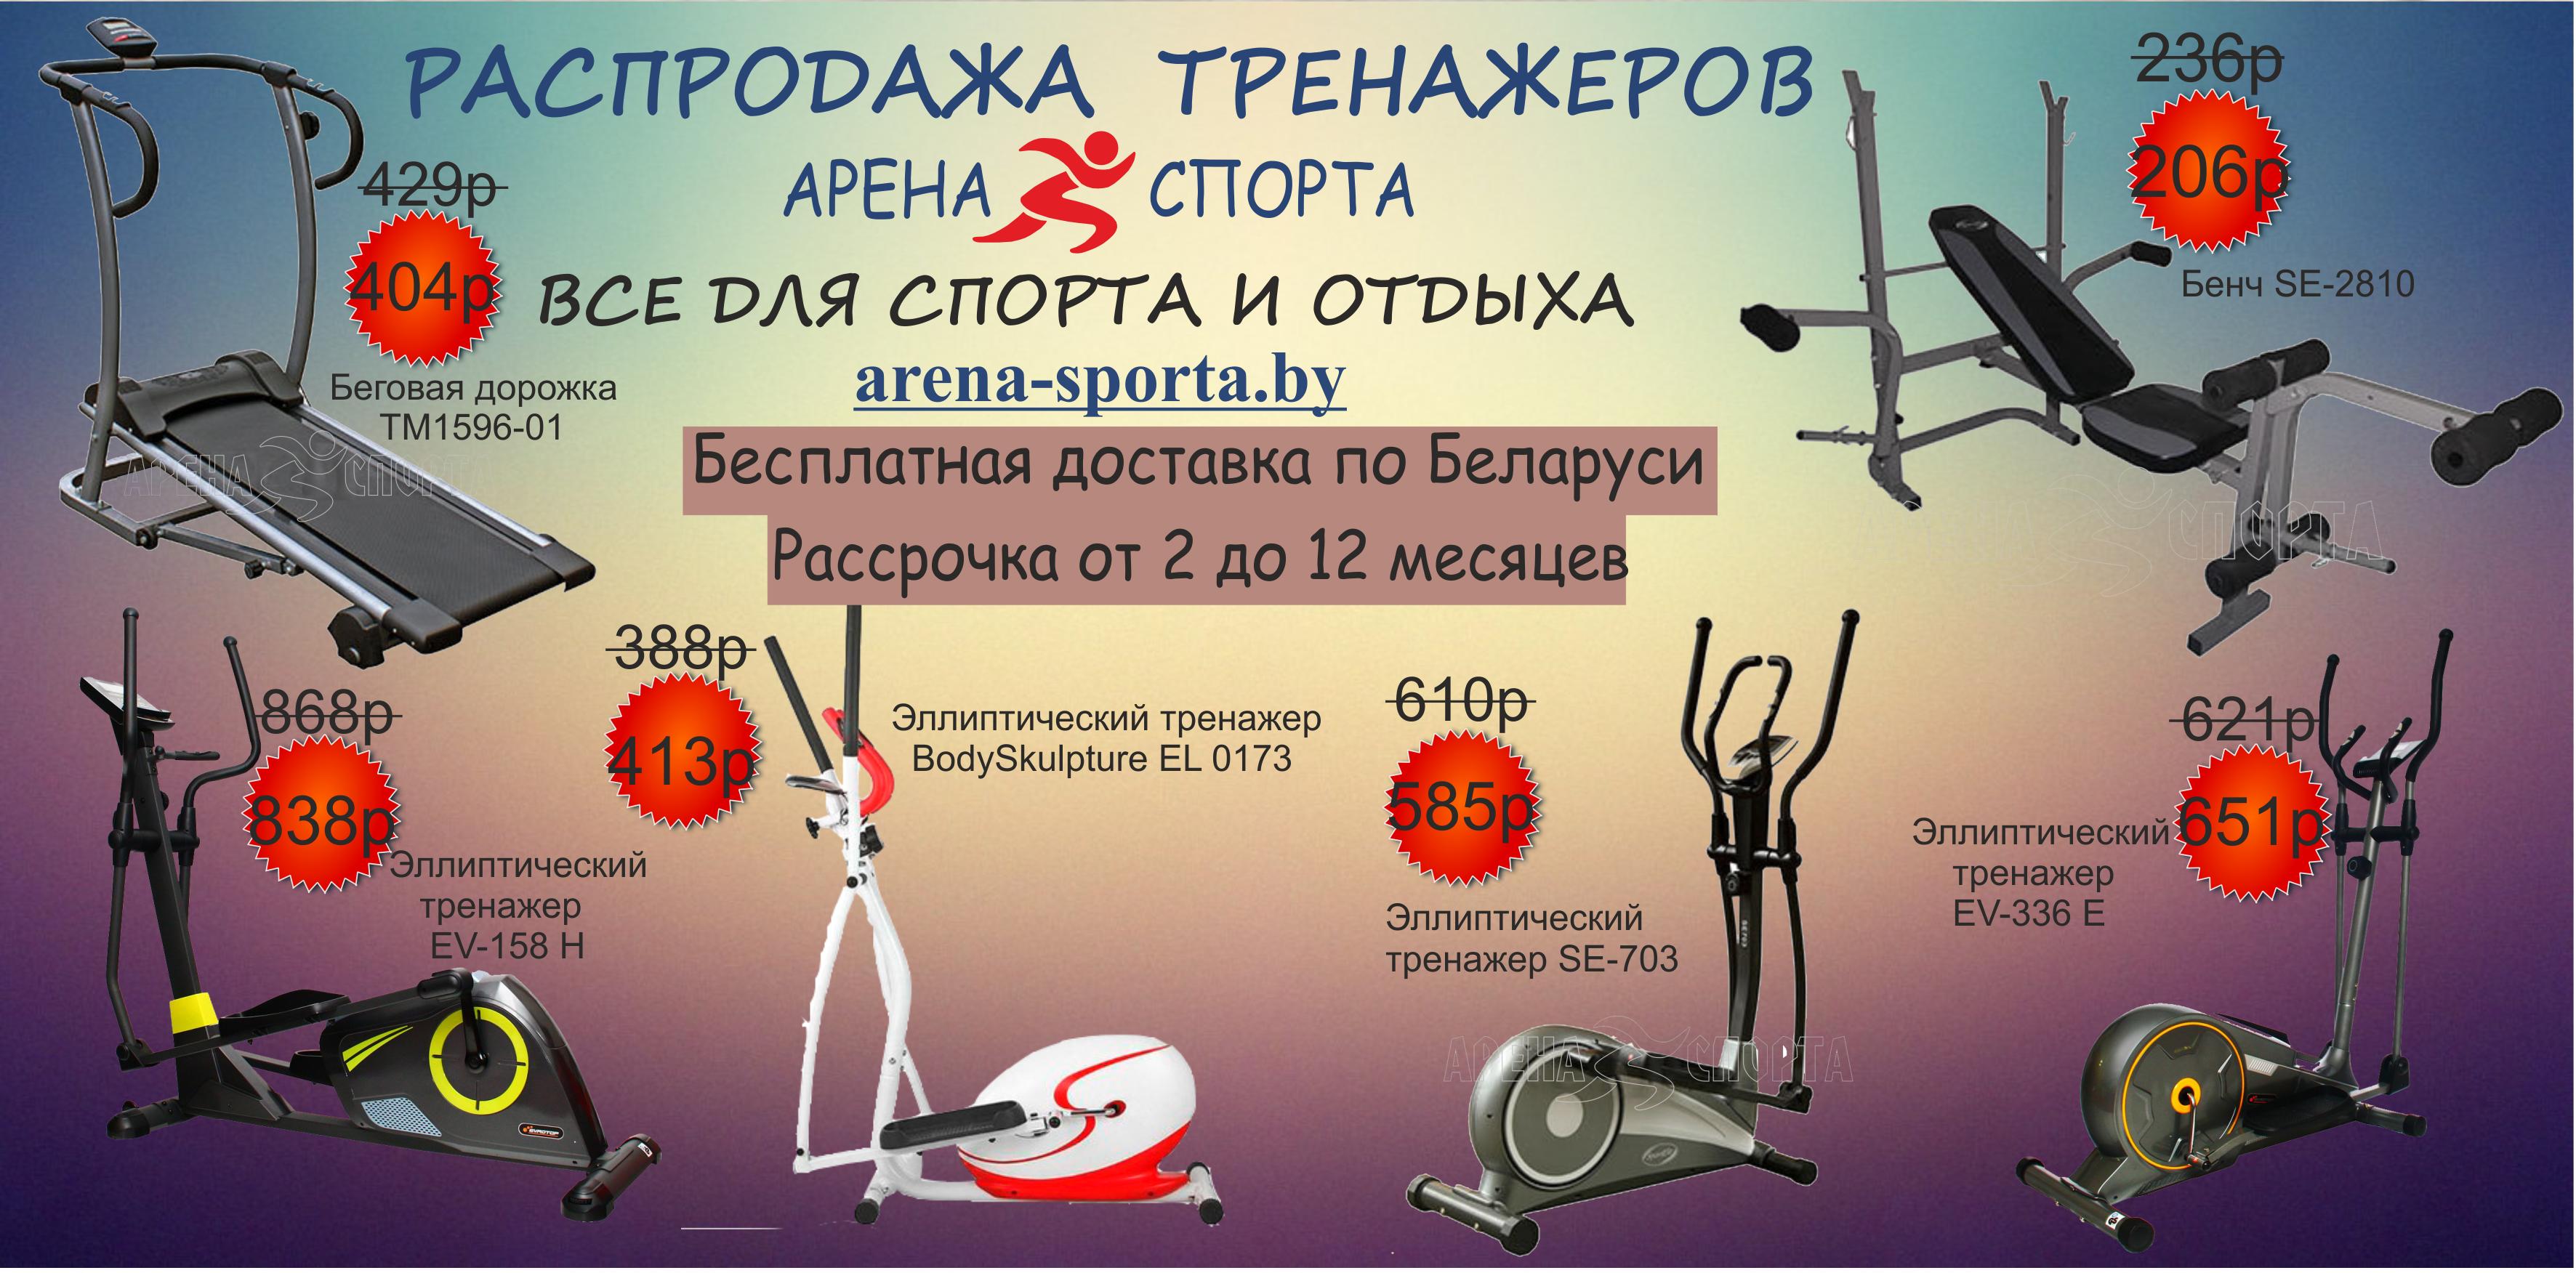 https://arena-sporta.by/catalog/trenazhery